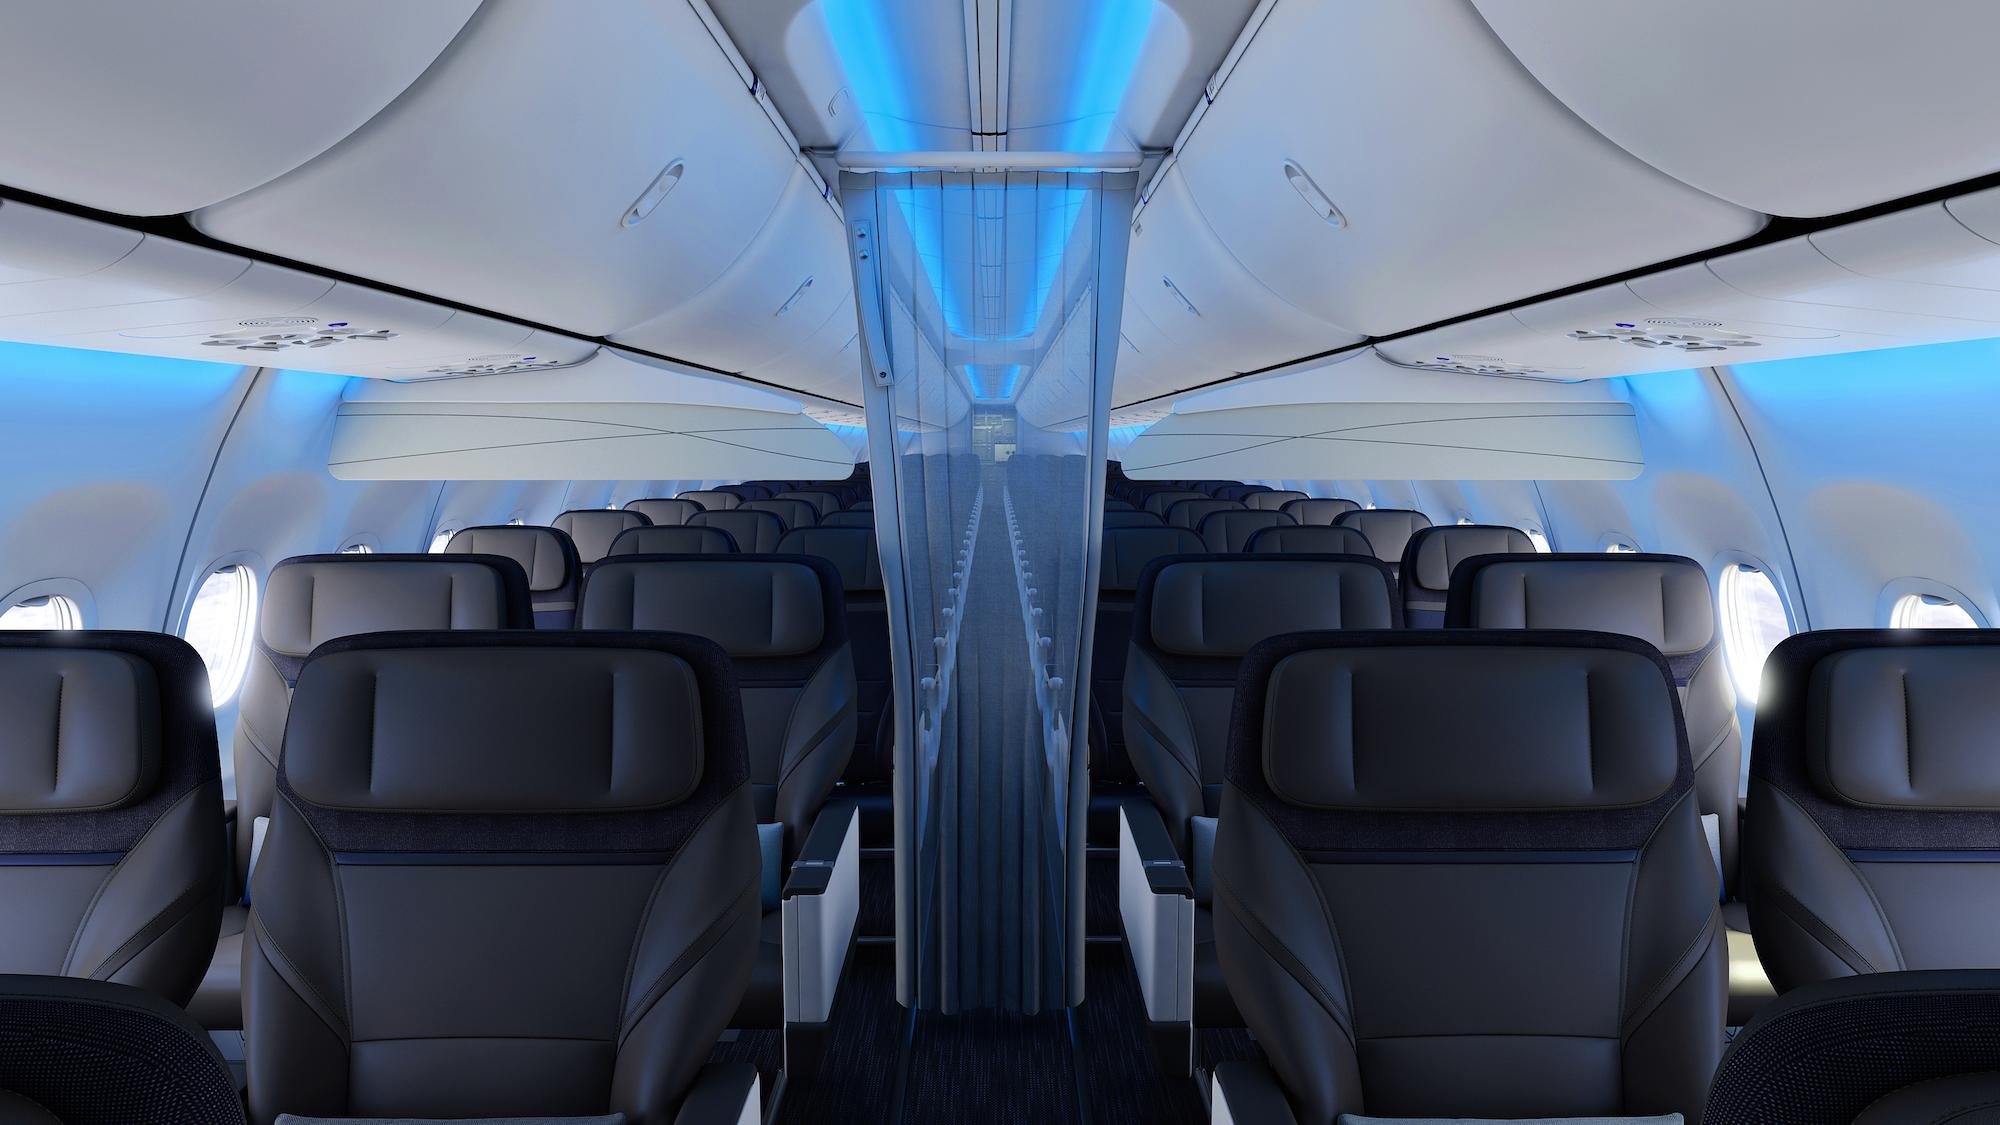 Mood lighting on fuel efficient Alaska Airlines planes.